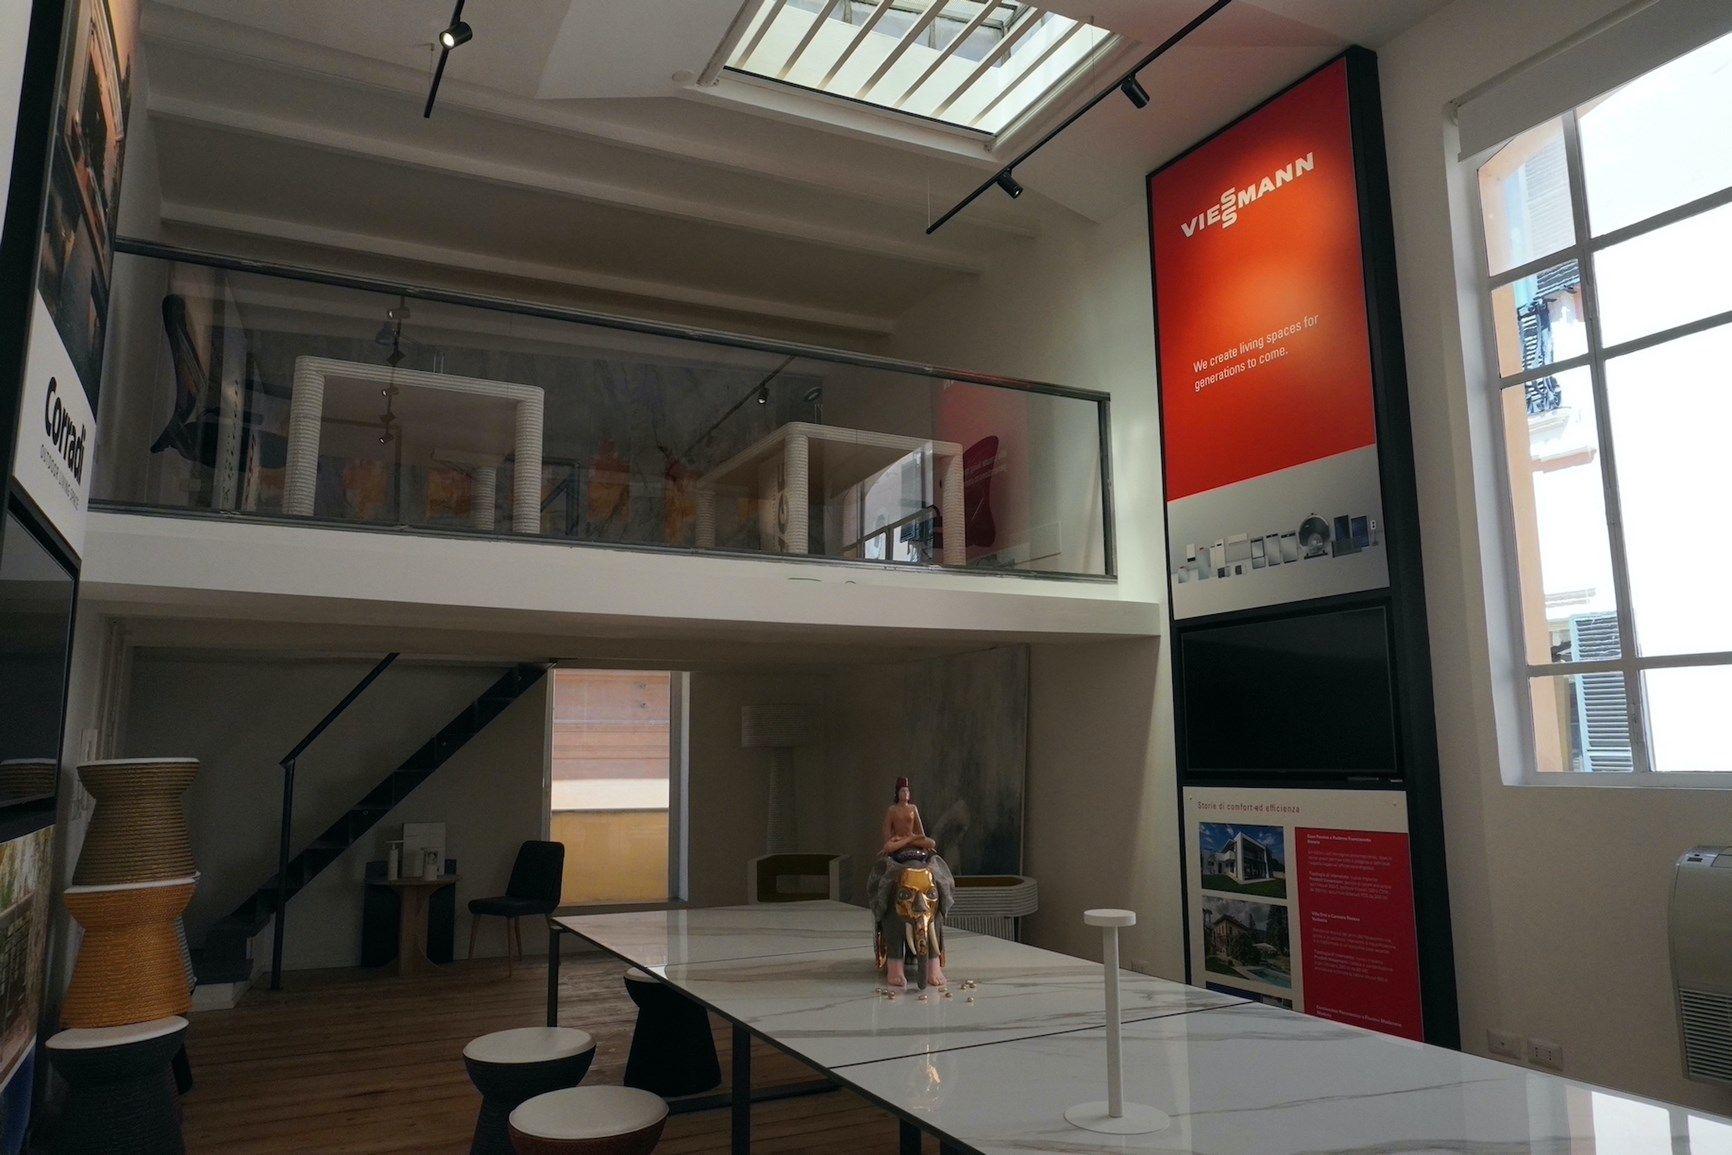 Viessmann partner di Canova Gallery, Hub di relazione, cultura e formazione